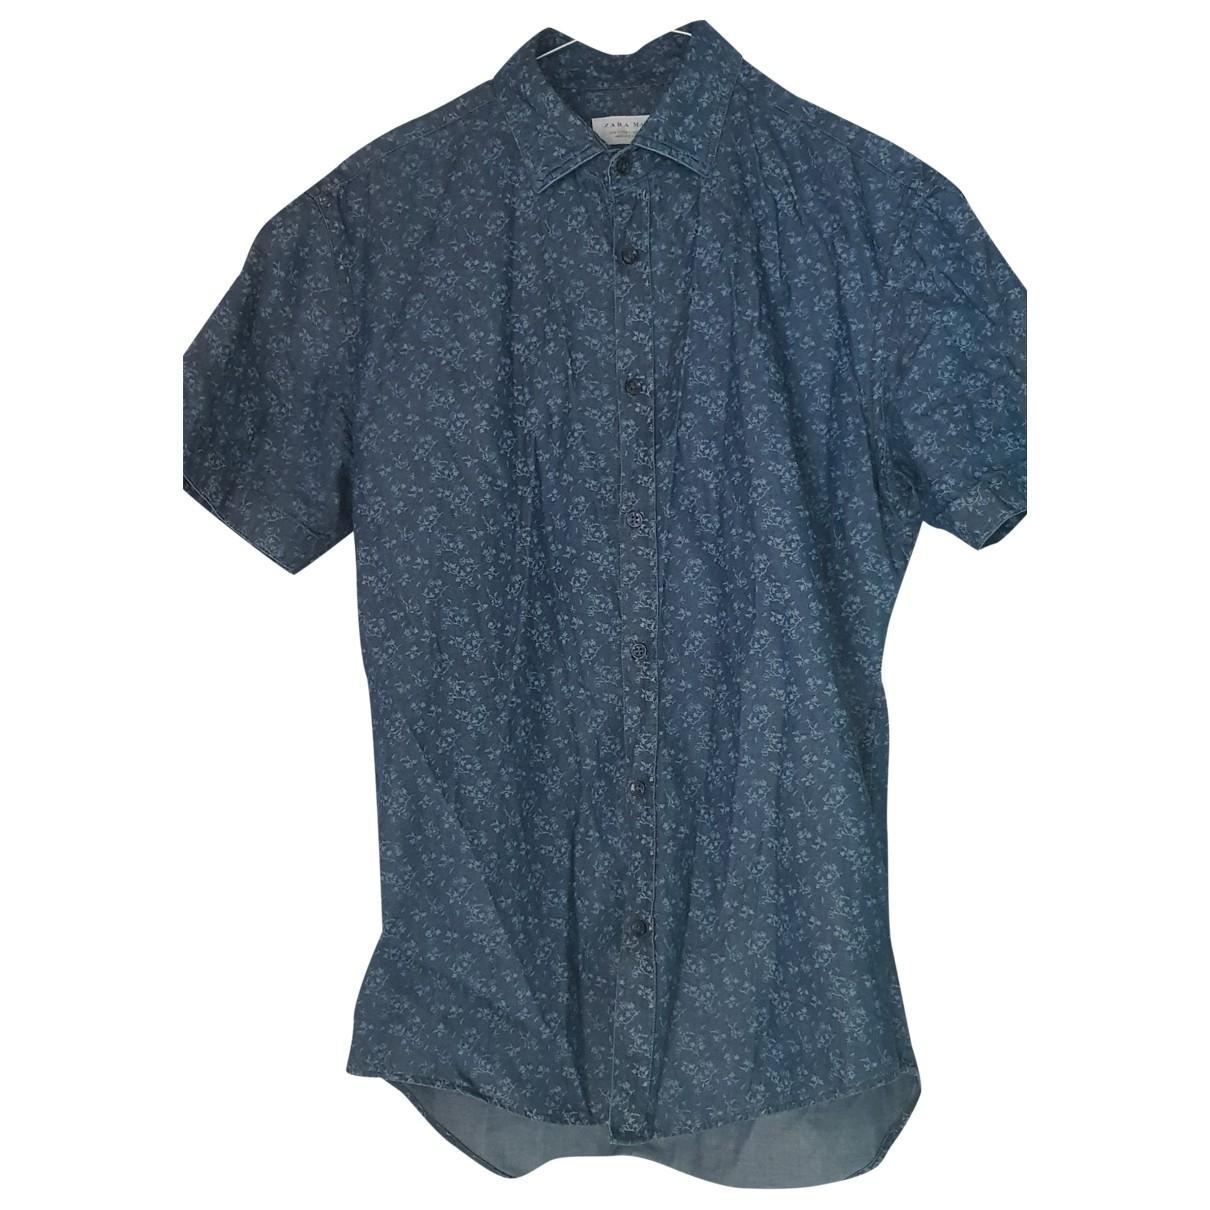 Zara \N Blue Cotton Shirts for Men S International